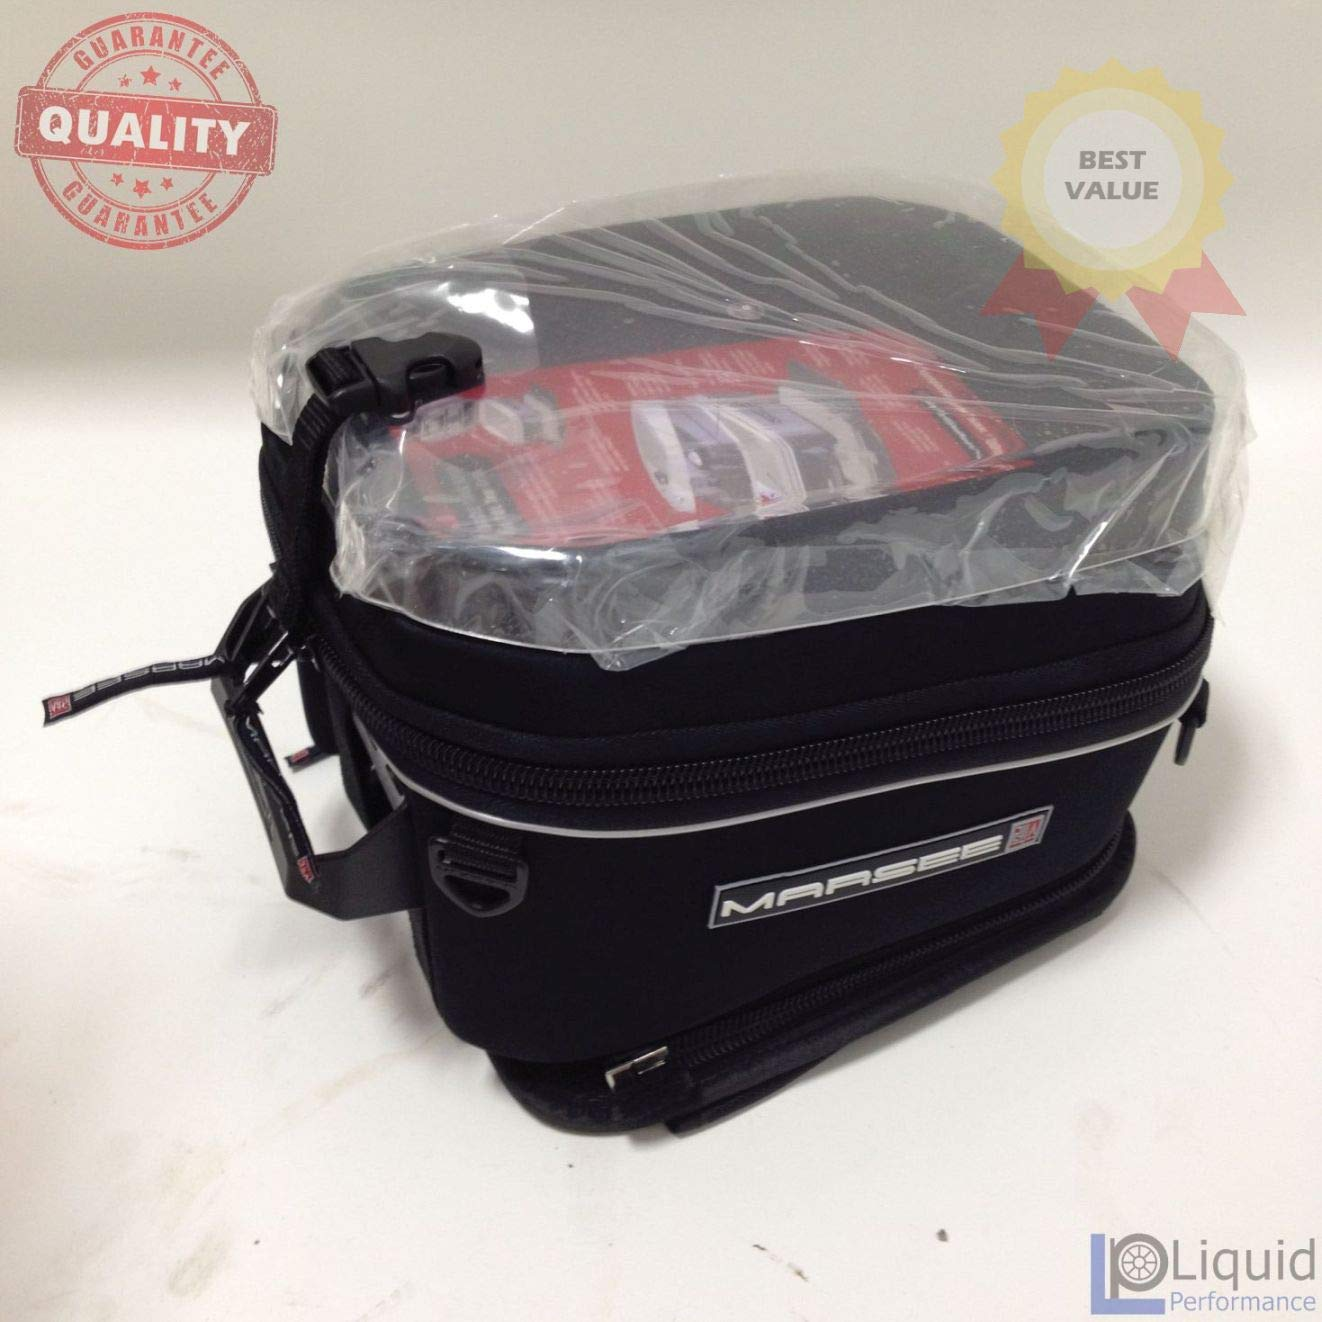 Marsee 10 L Teardrop w/Magnetic Mount, Tank bag, Universal Fit Motorcycle luggage (MAR-10DM)